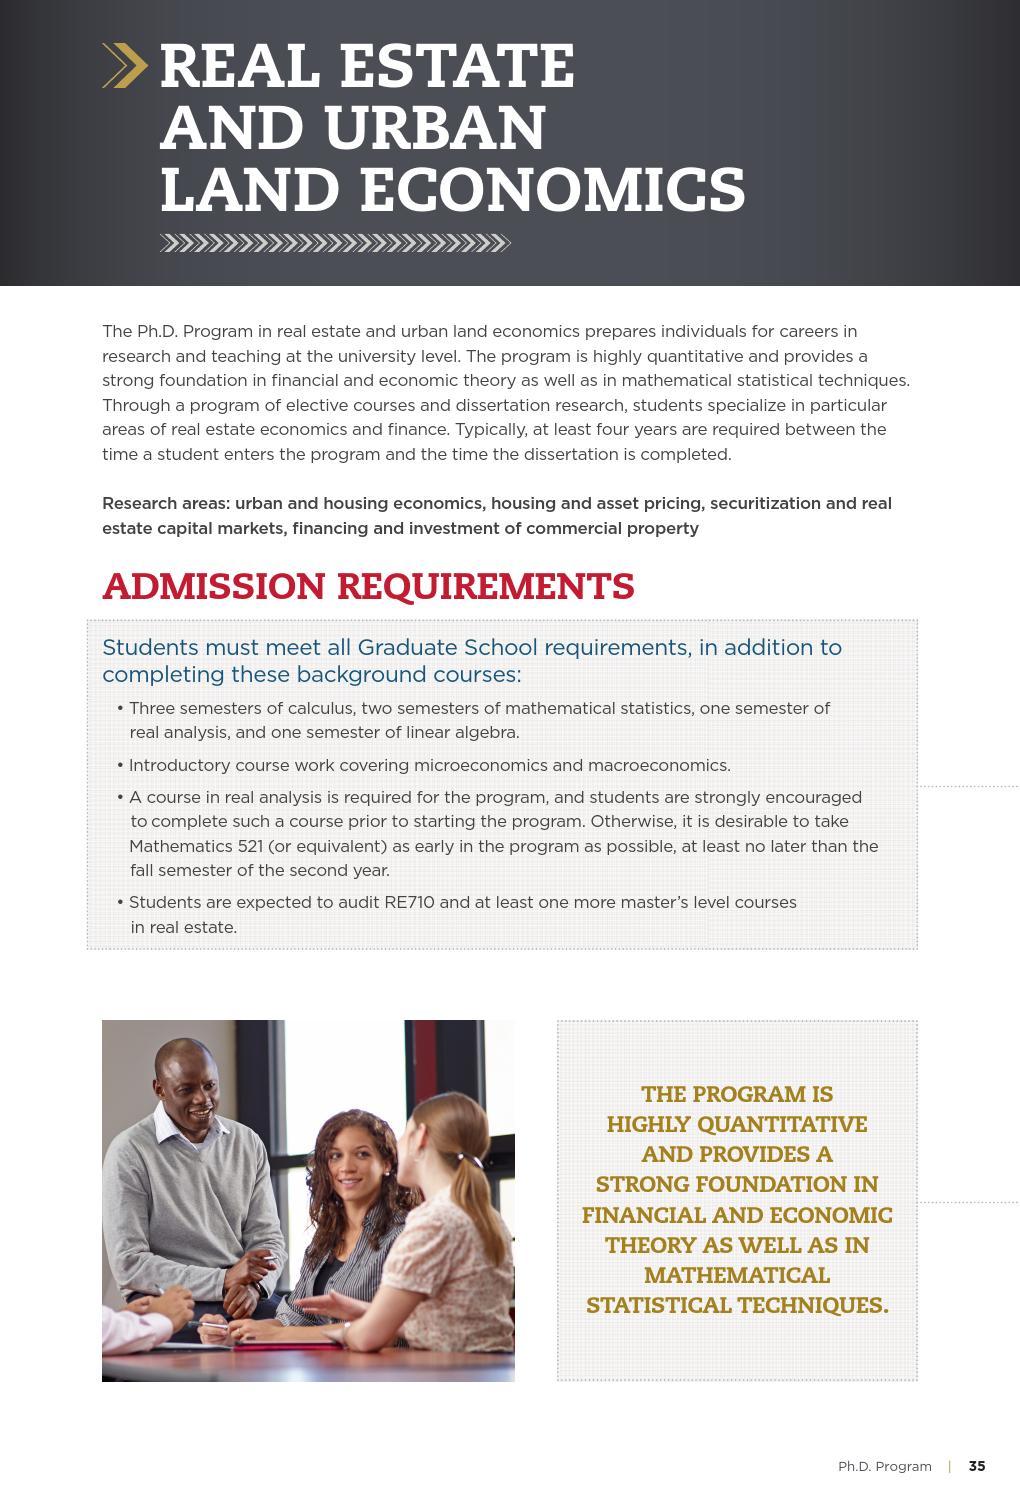 Wisconsin Ph D  Program Brochure by University of Wisconsin-Madison